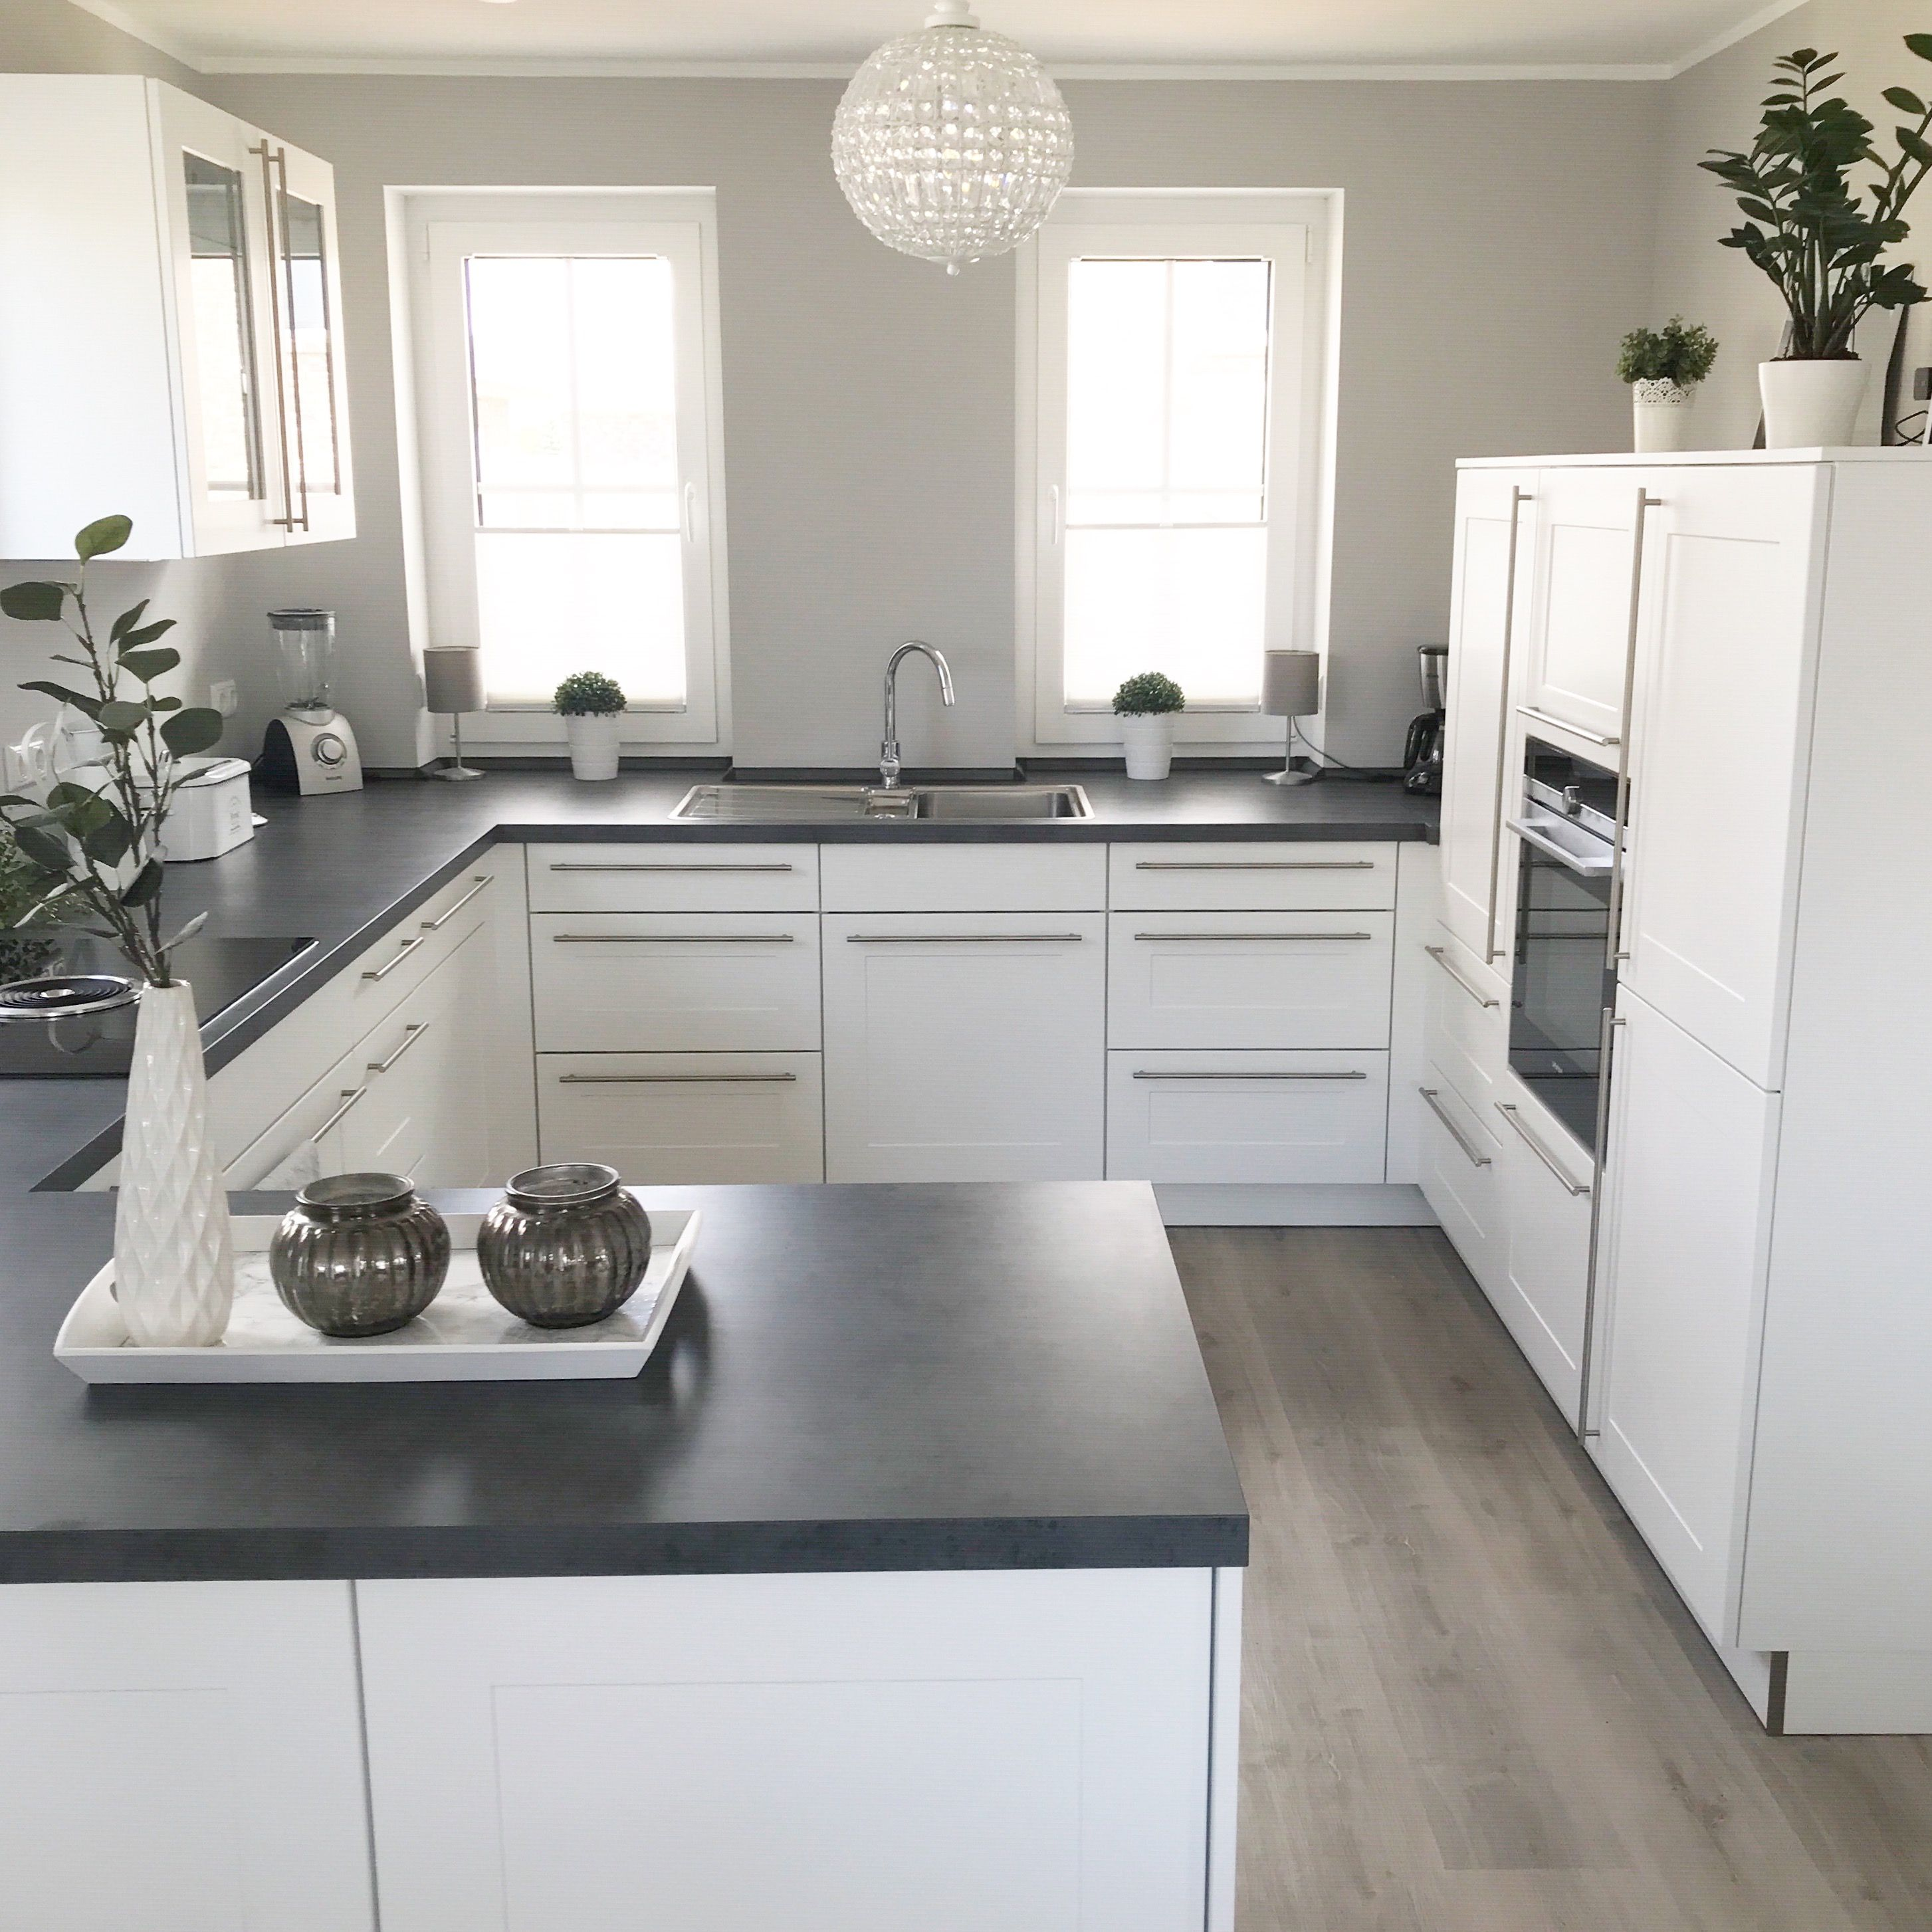 Instagram Wohn Emotion Landhaus Kuche Kitchen Modern Grau Weiss Grey White Haus Kuchen Landhauskuche Kuche Landhaus Modern